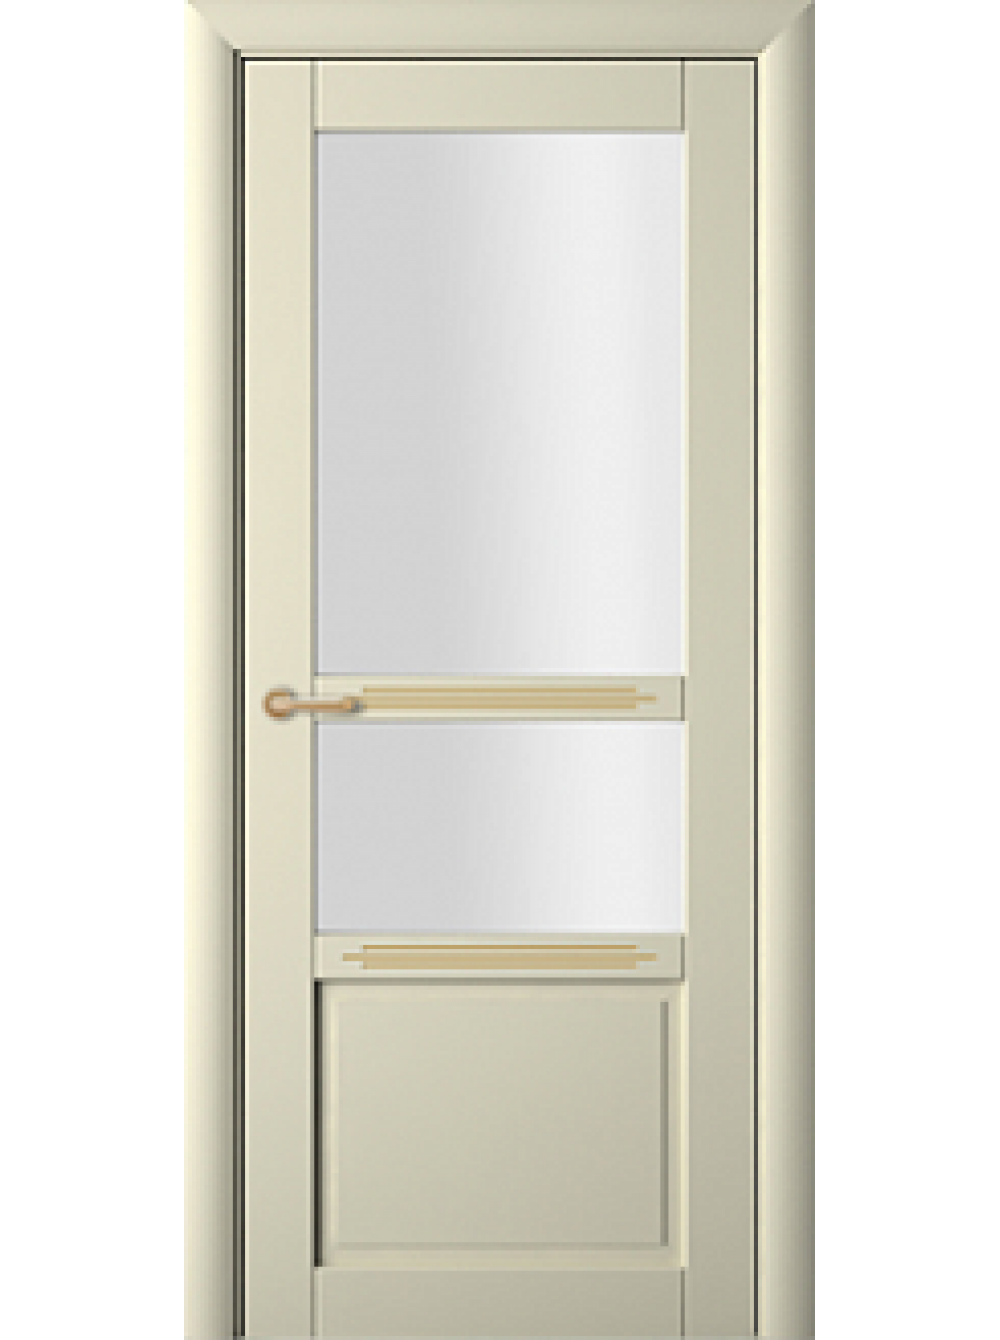 Sarto perfecto interior door beech ivory with caramel